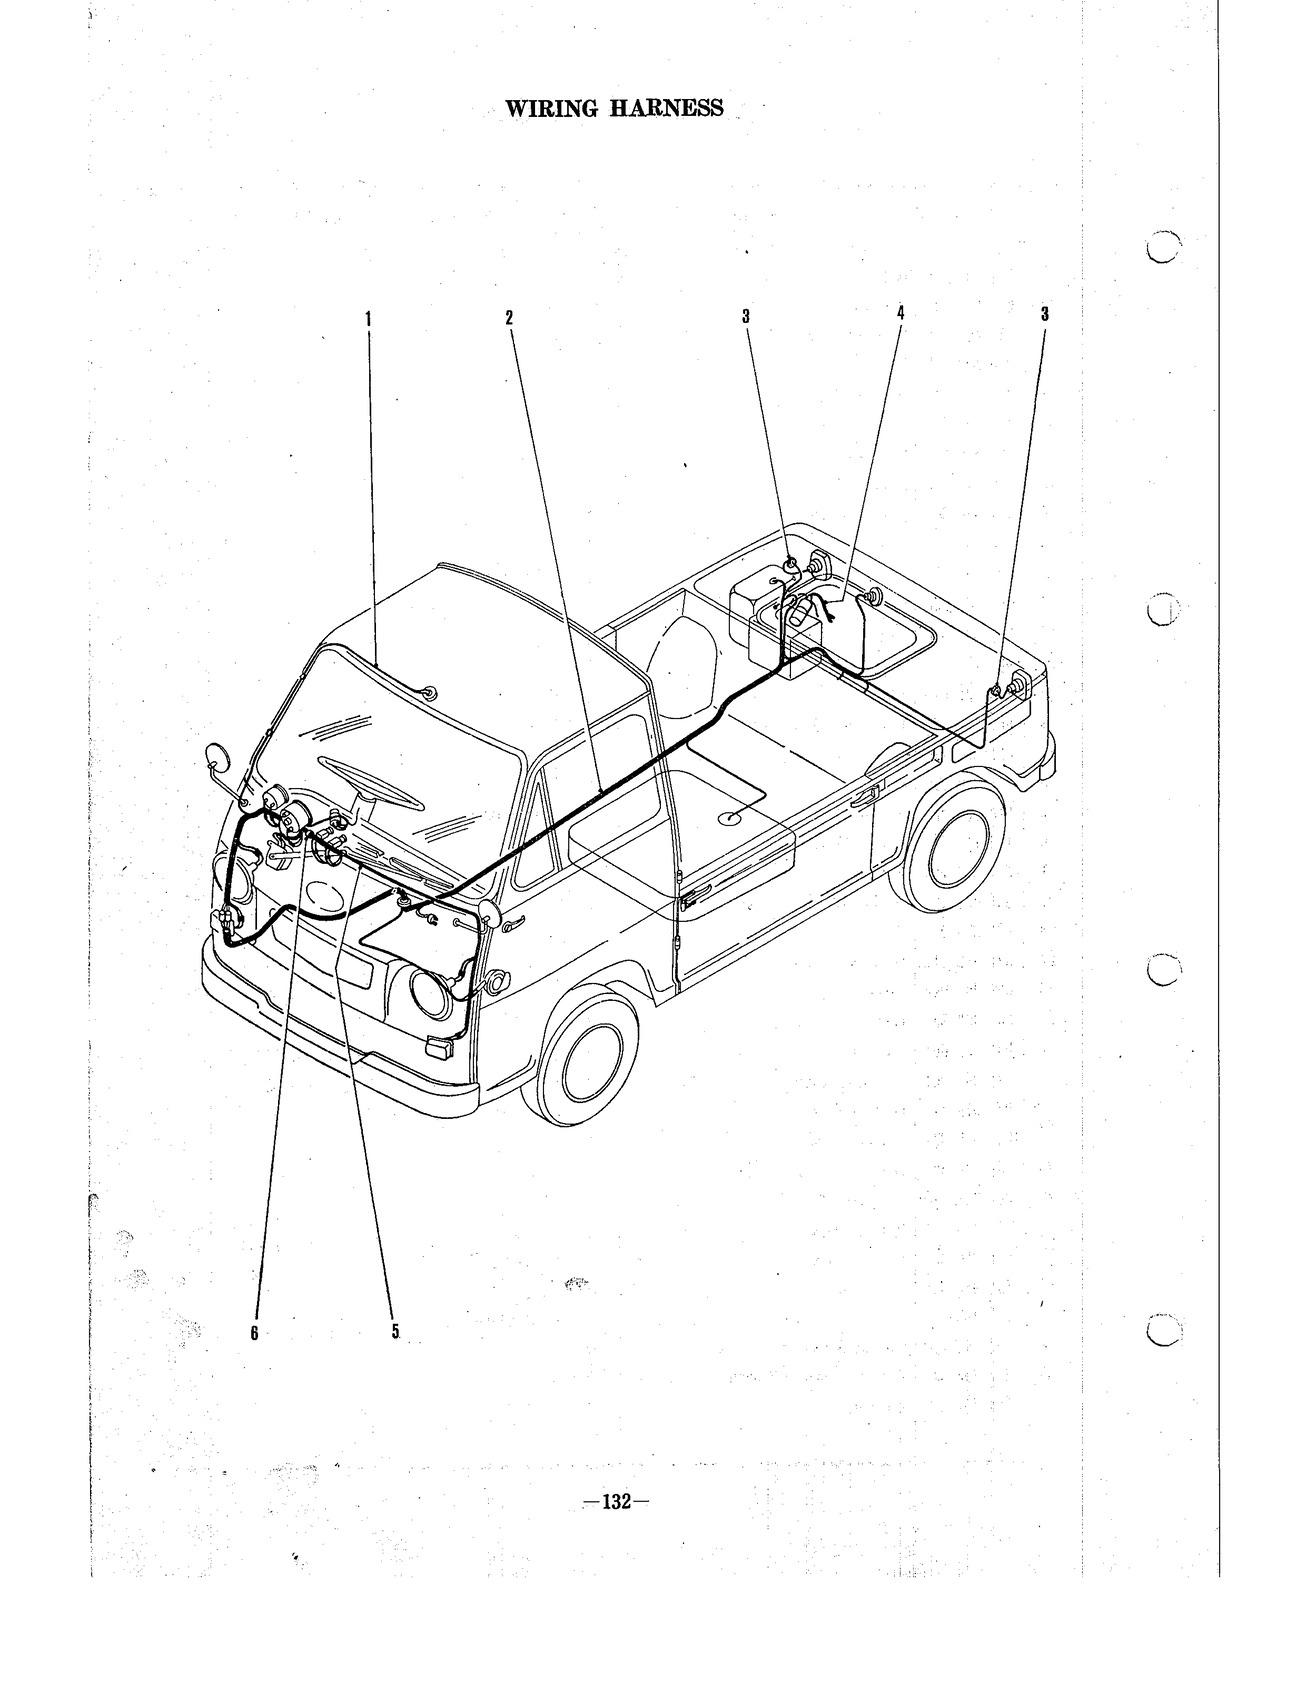 hight resolution of subaru 360 sambar parts 132 littlecartrader little car trader subaru forester wiring diagram subaru 360 wiring diagram